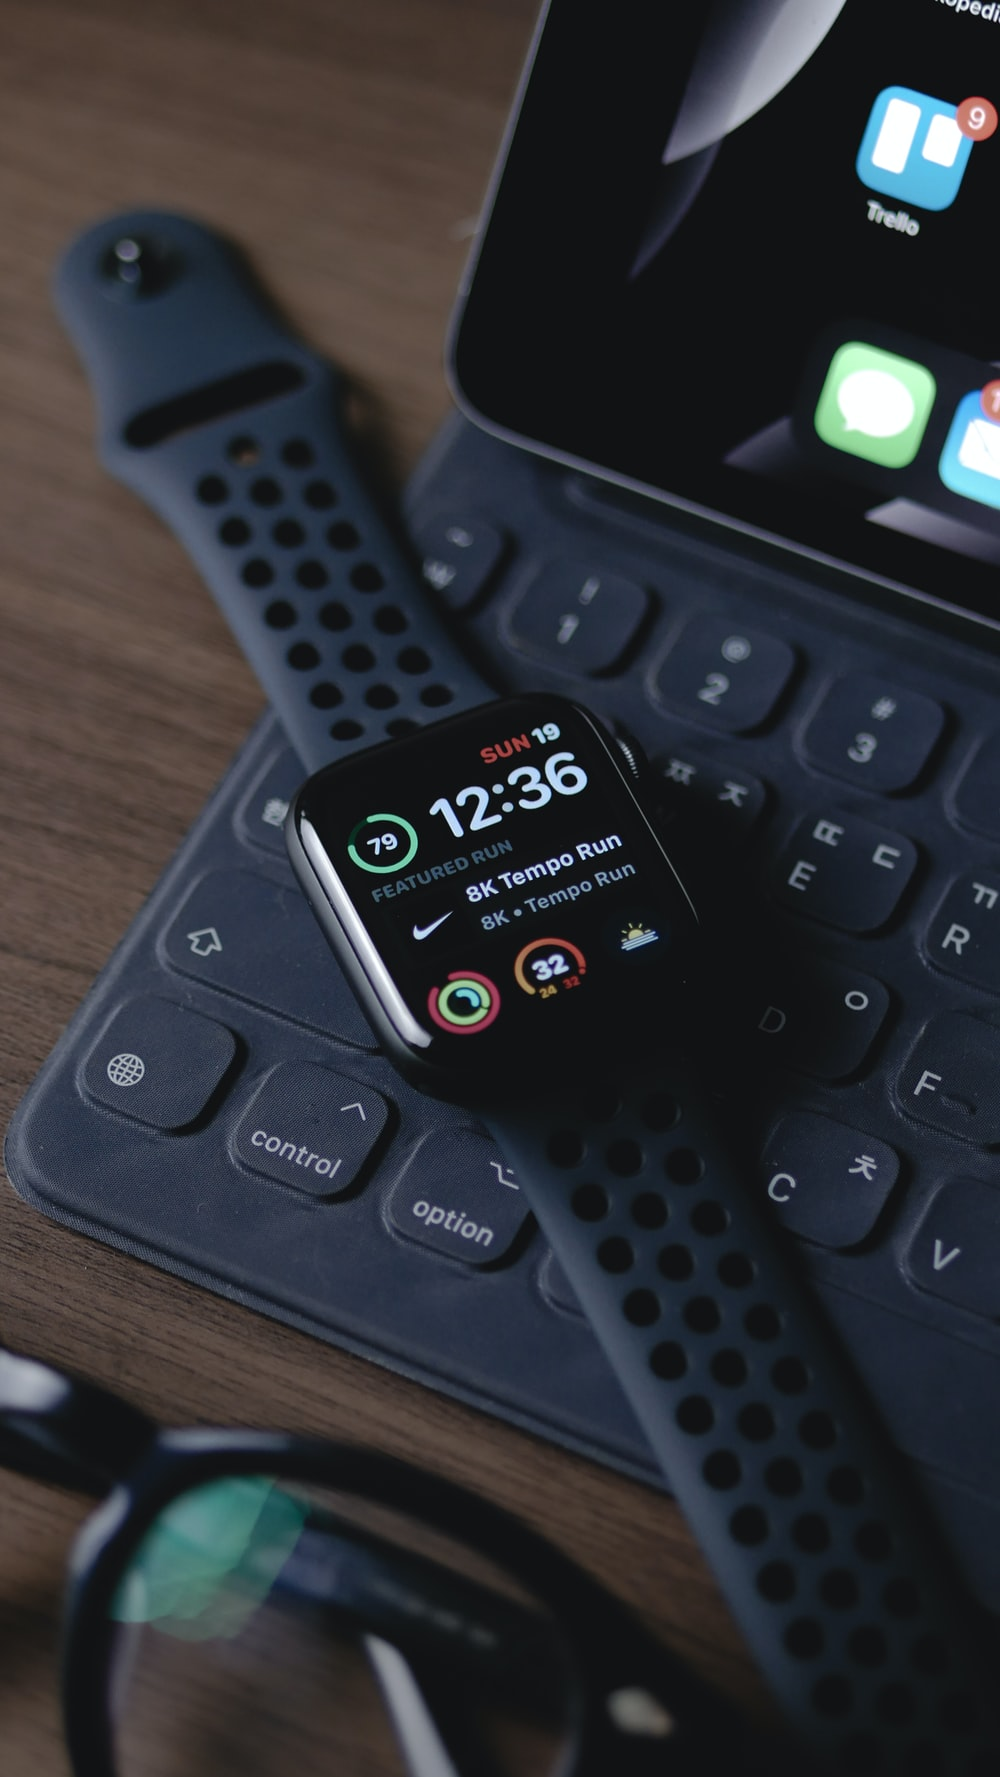 black smart watch on black computer keyboard